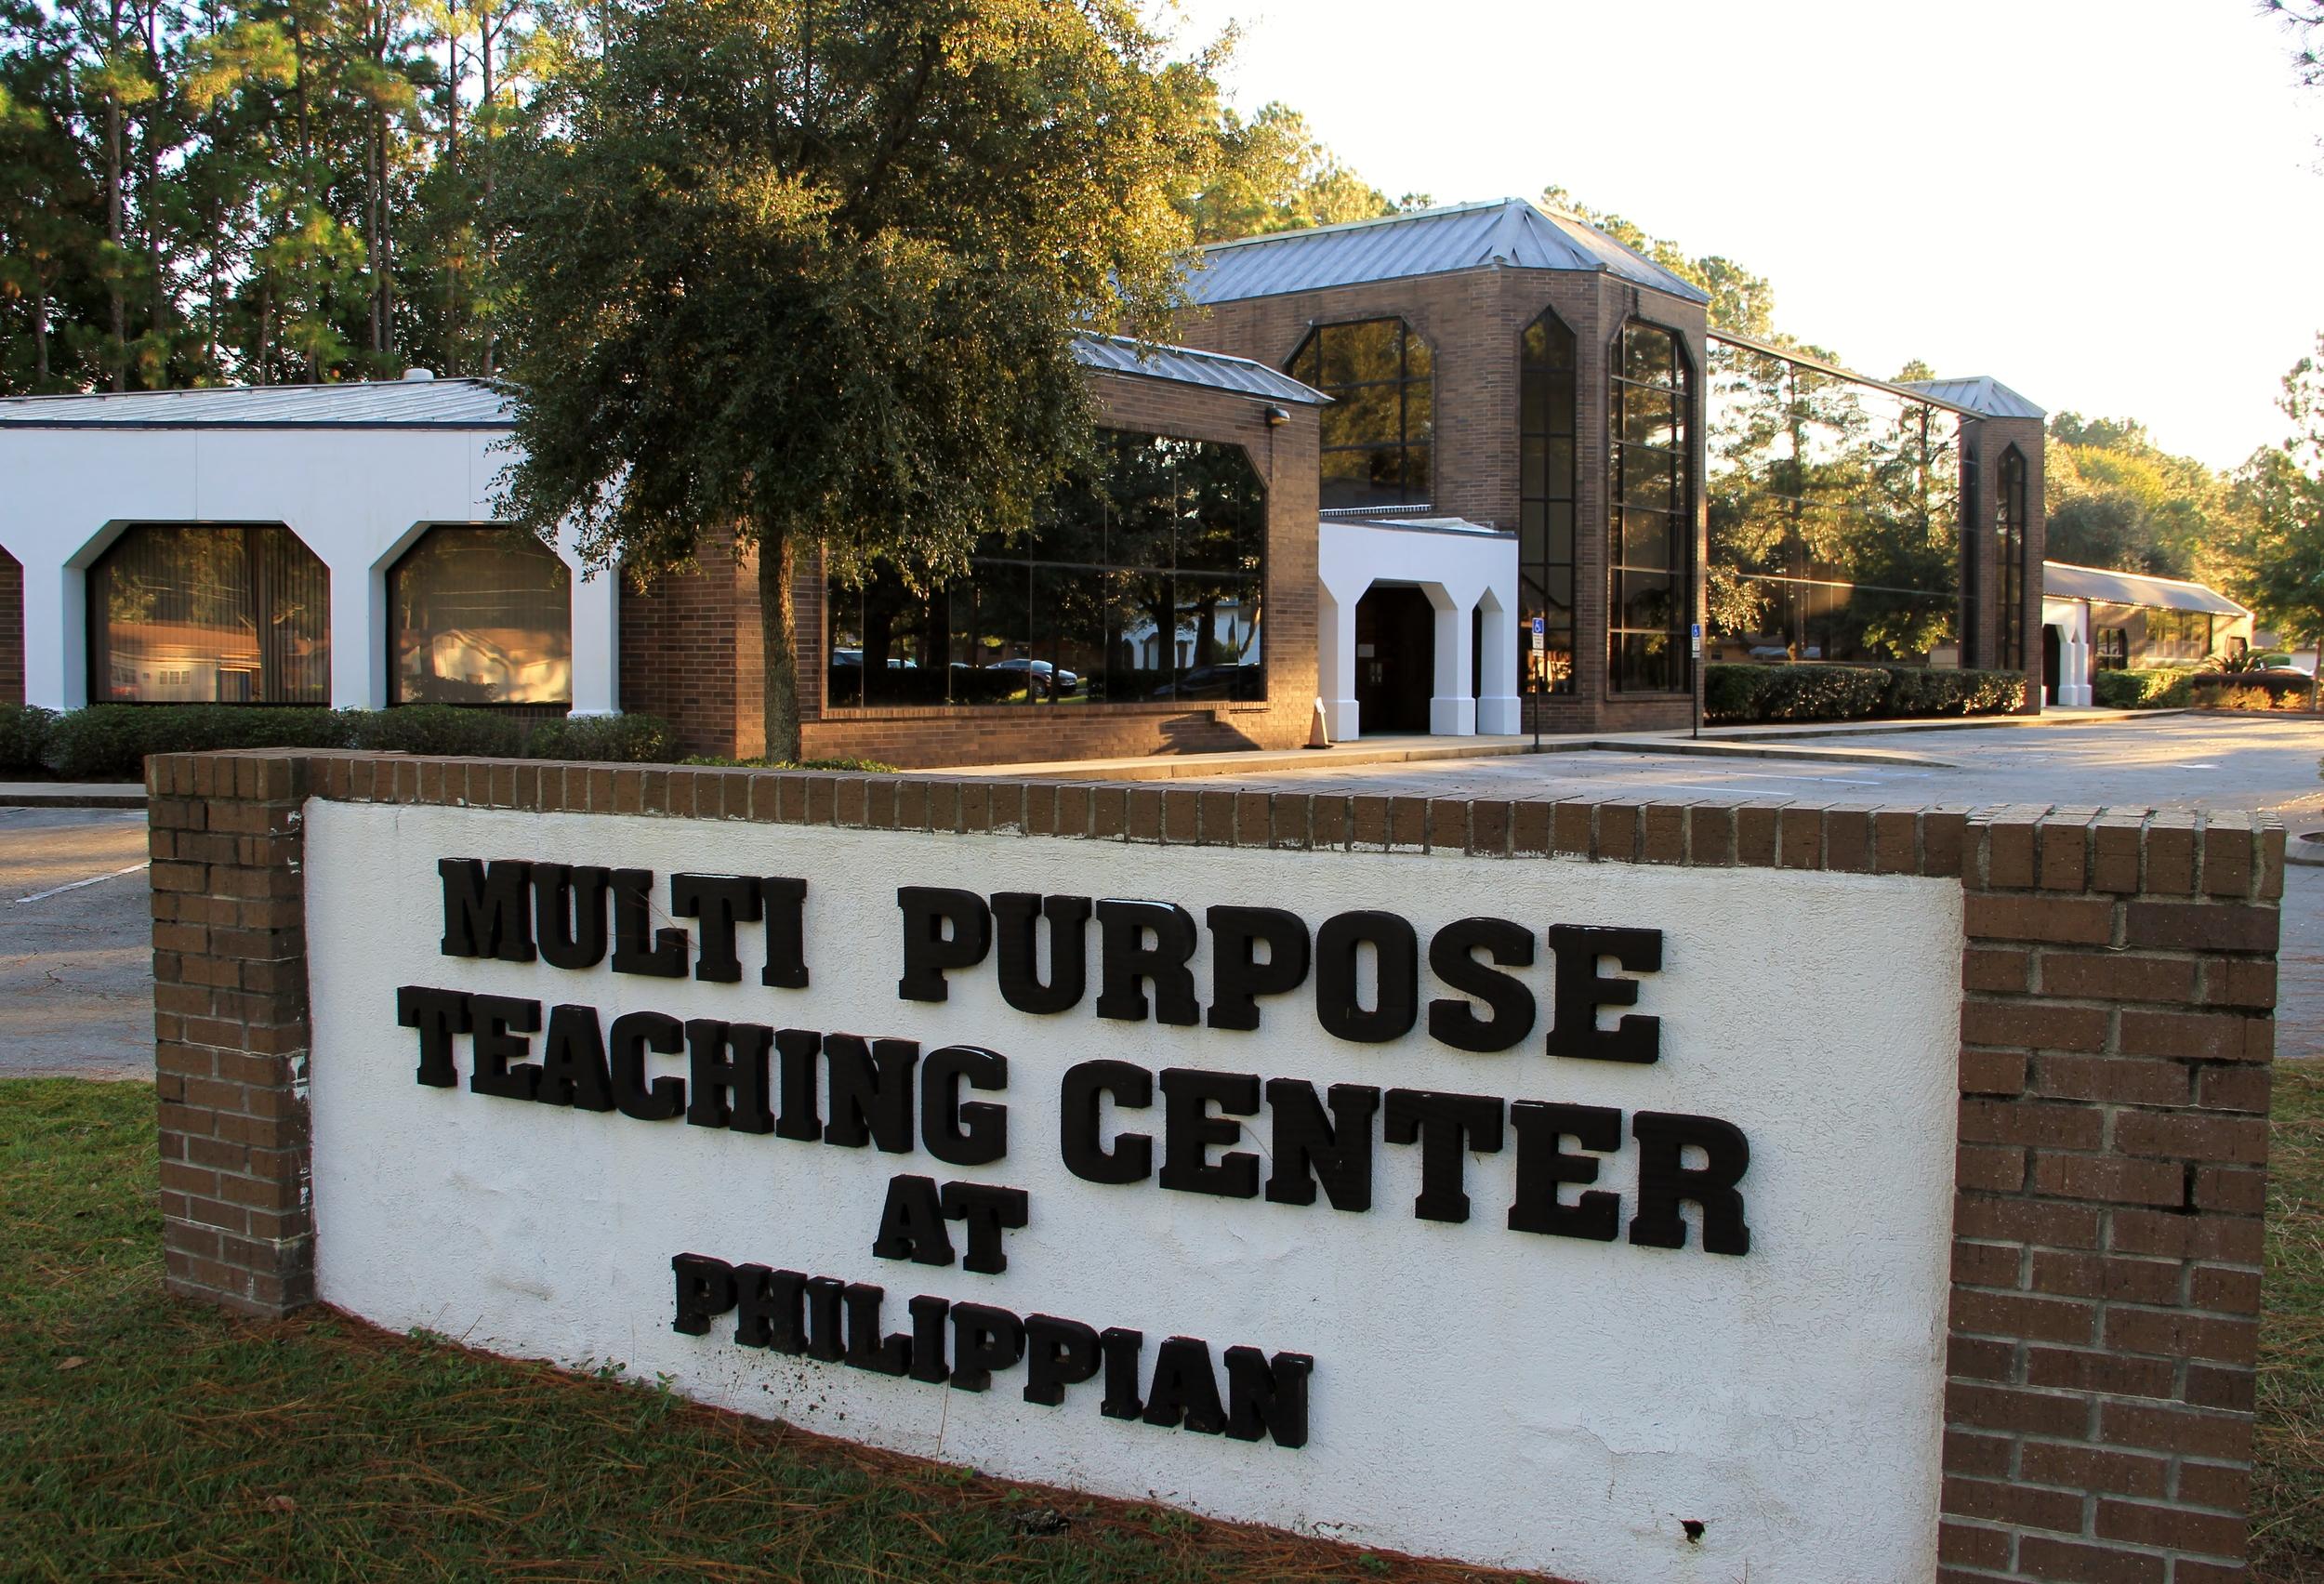 Muti Purpse Center Signage